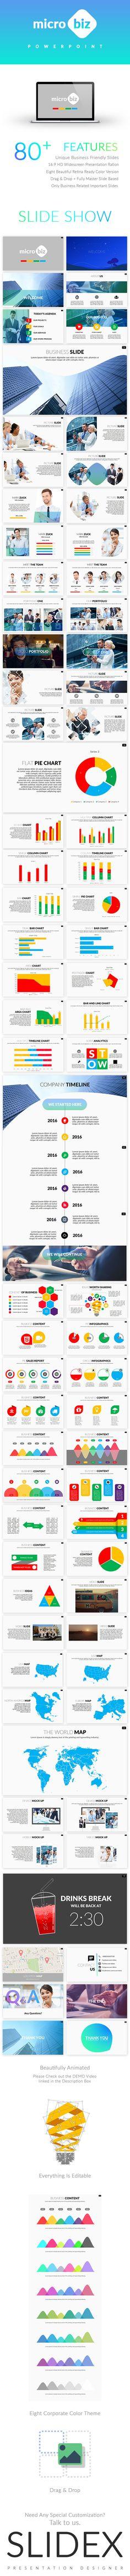 flip presentation (powerpoint templates) | flipping, presentation, Presentation templates